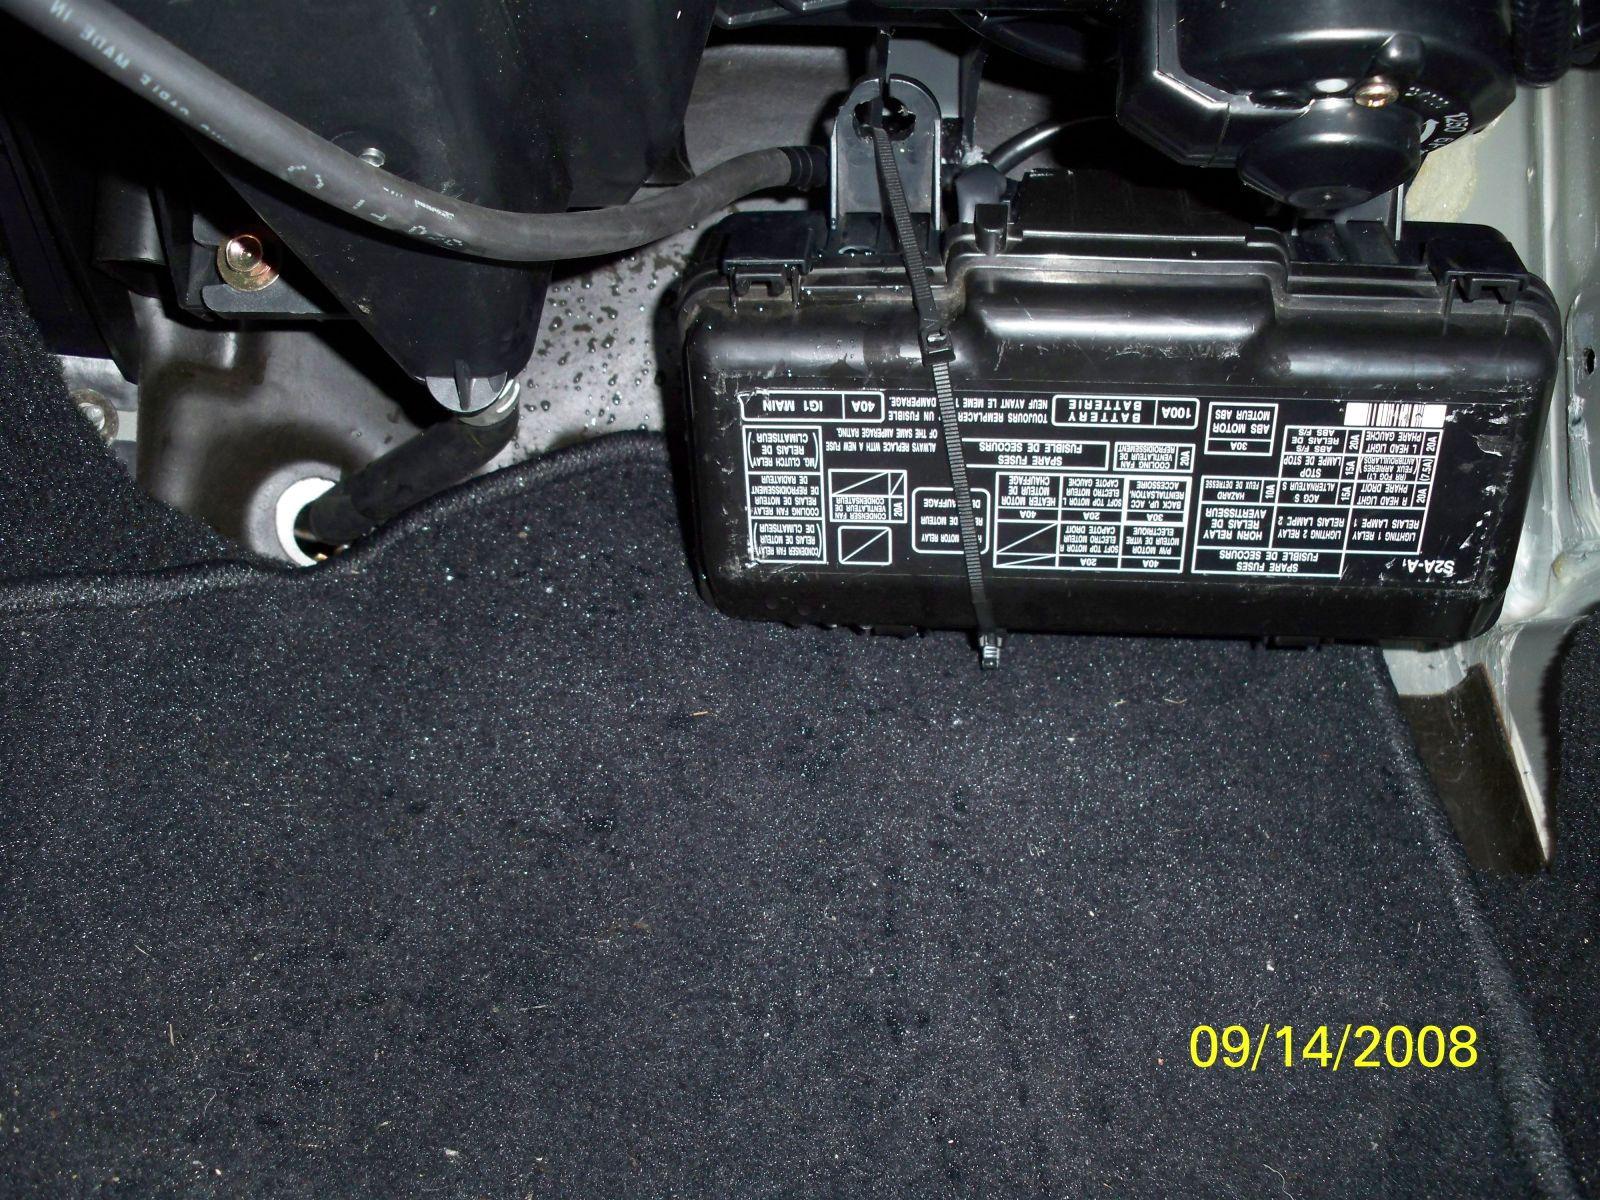 Honda S2000 Fuse Box Relocation Kit Electrical Wiring Diagram Battery Diy Diydrywalls Org